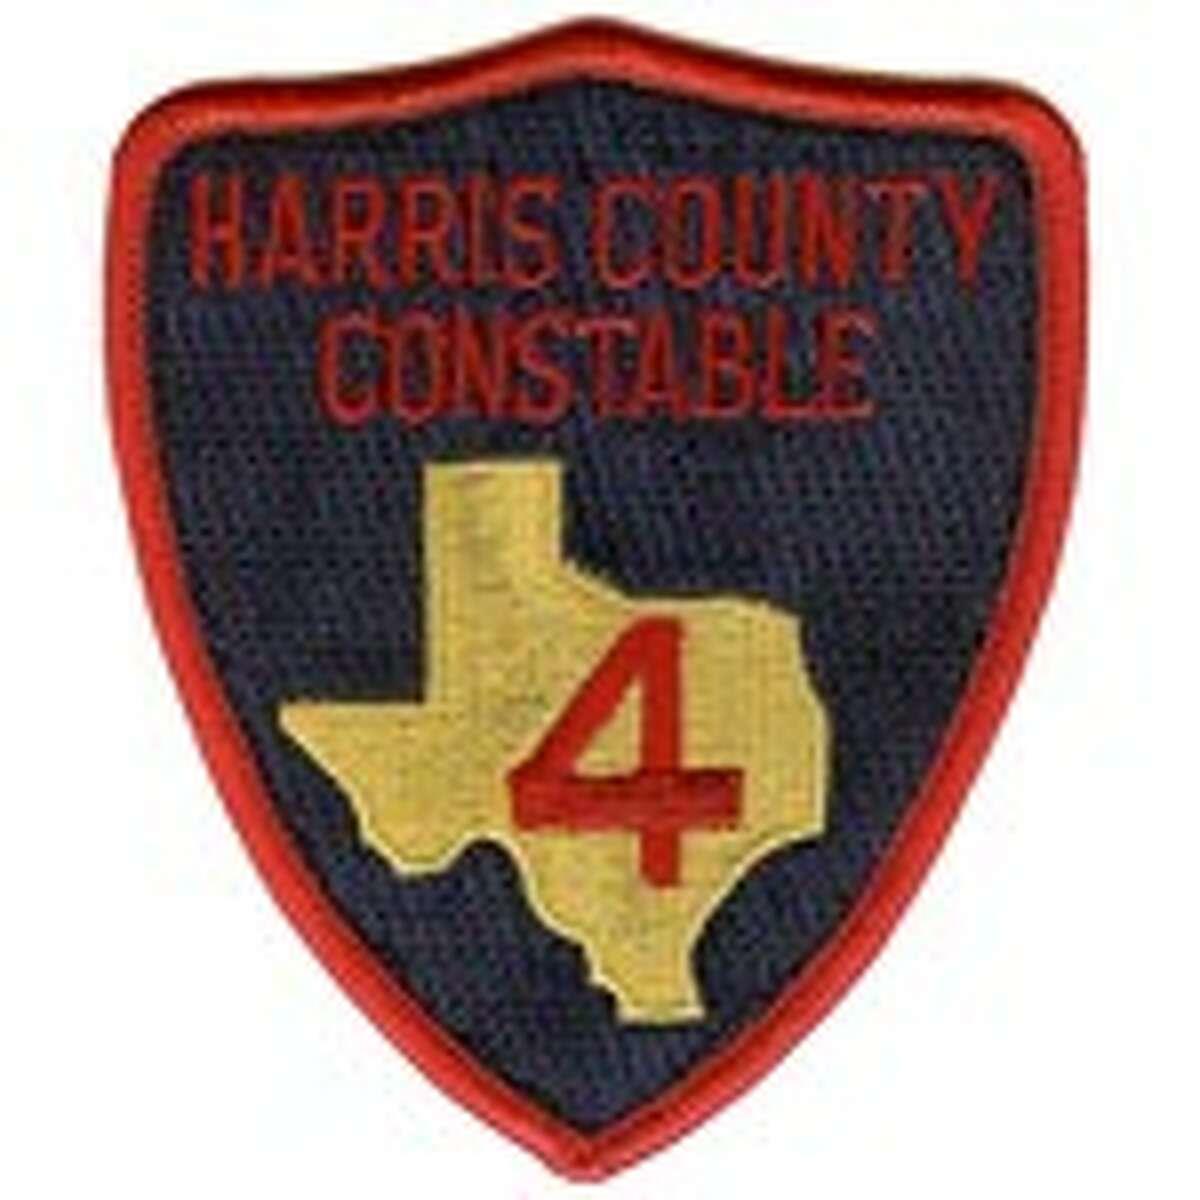 Harris County Pct. 4 Constable Blotter